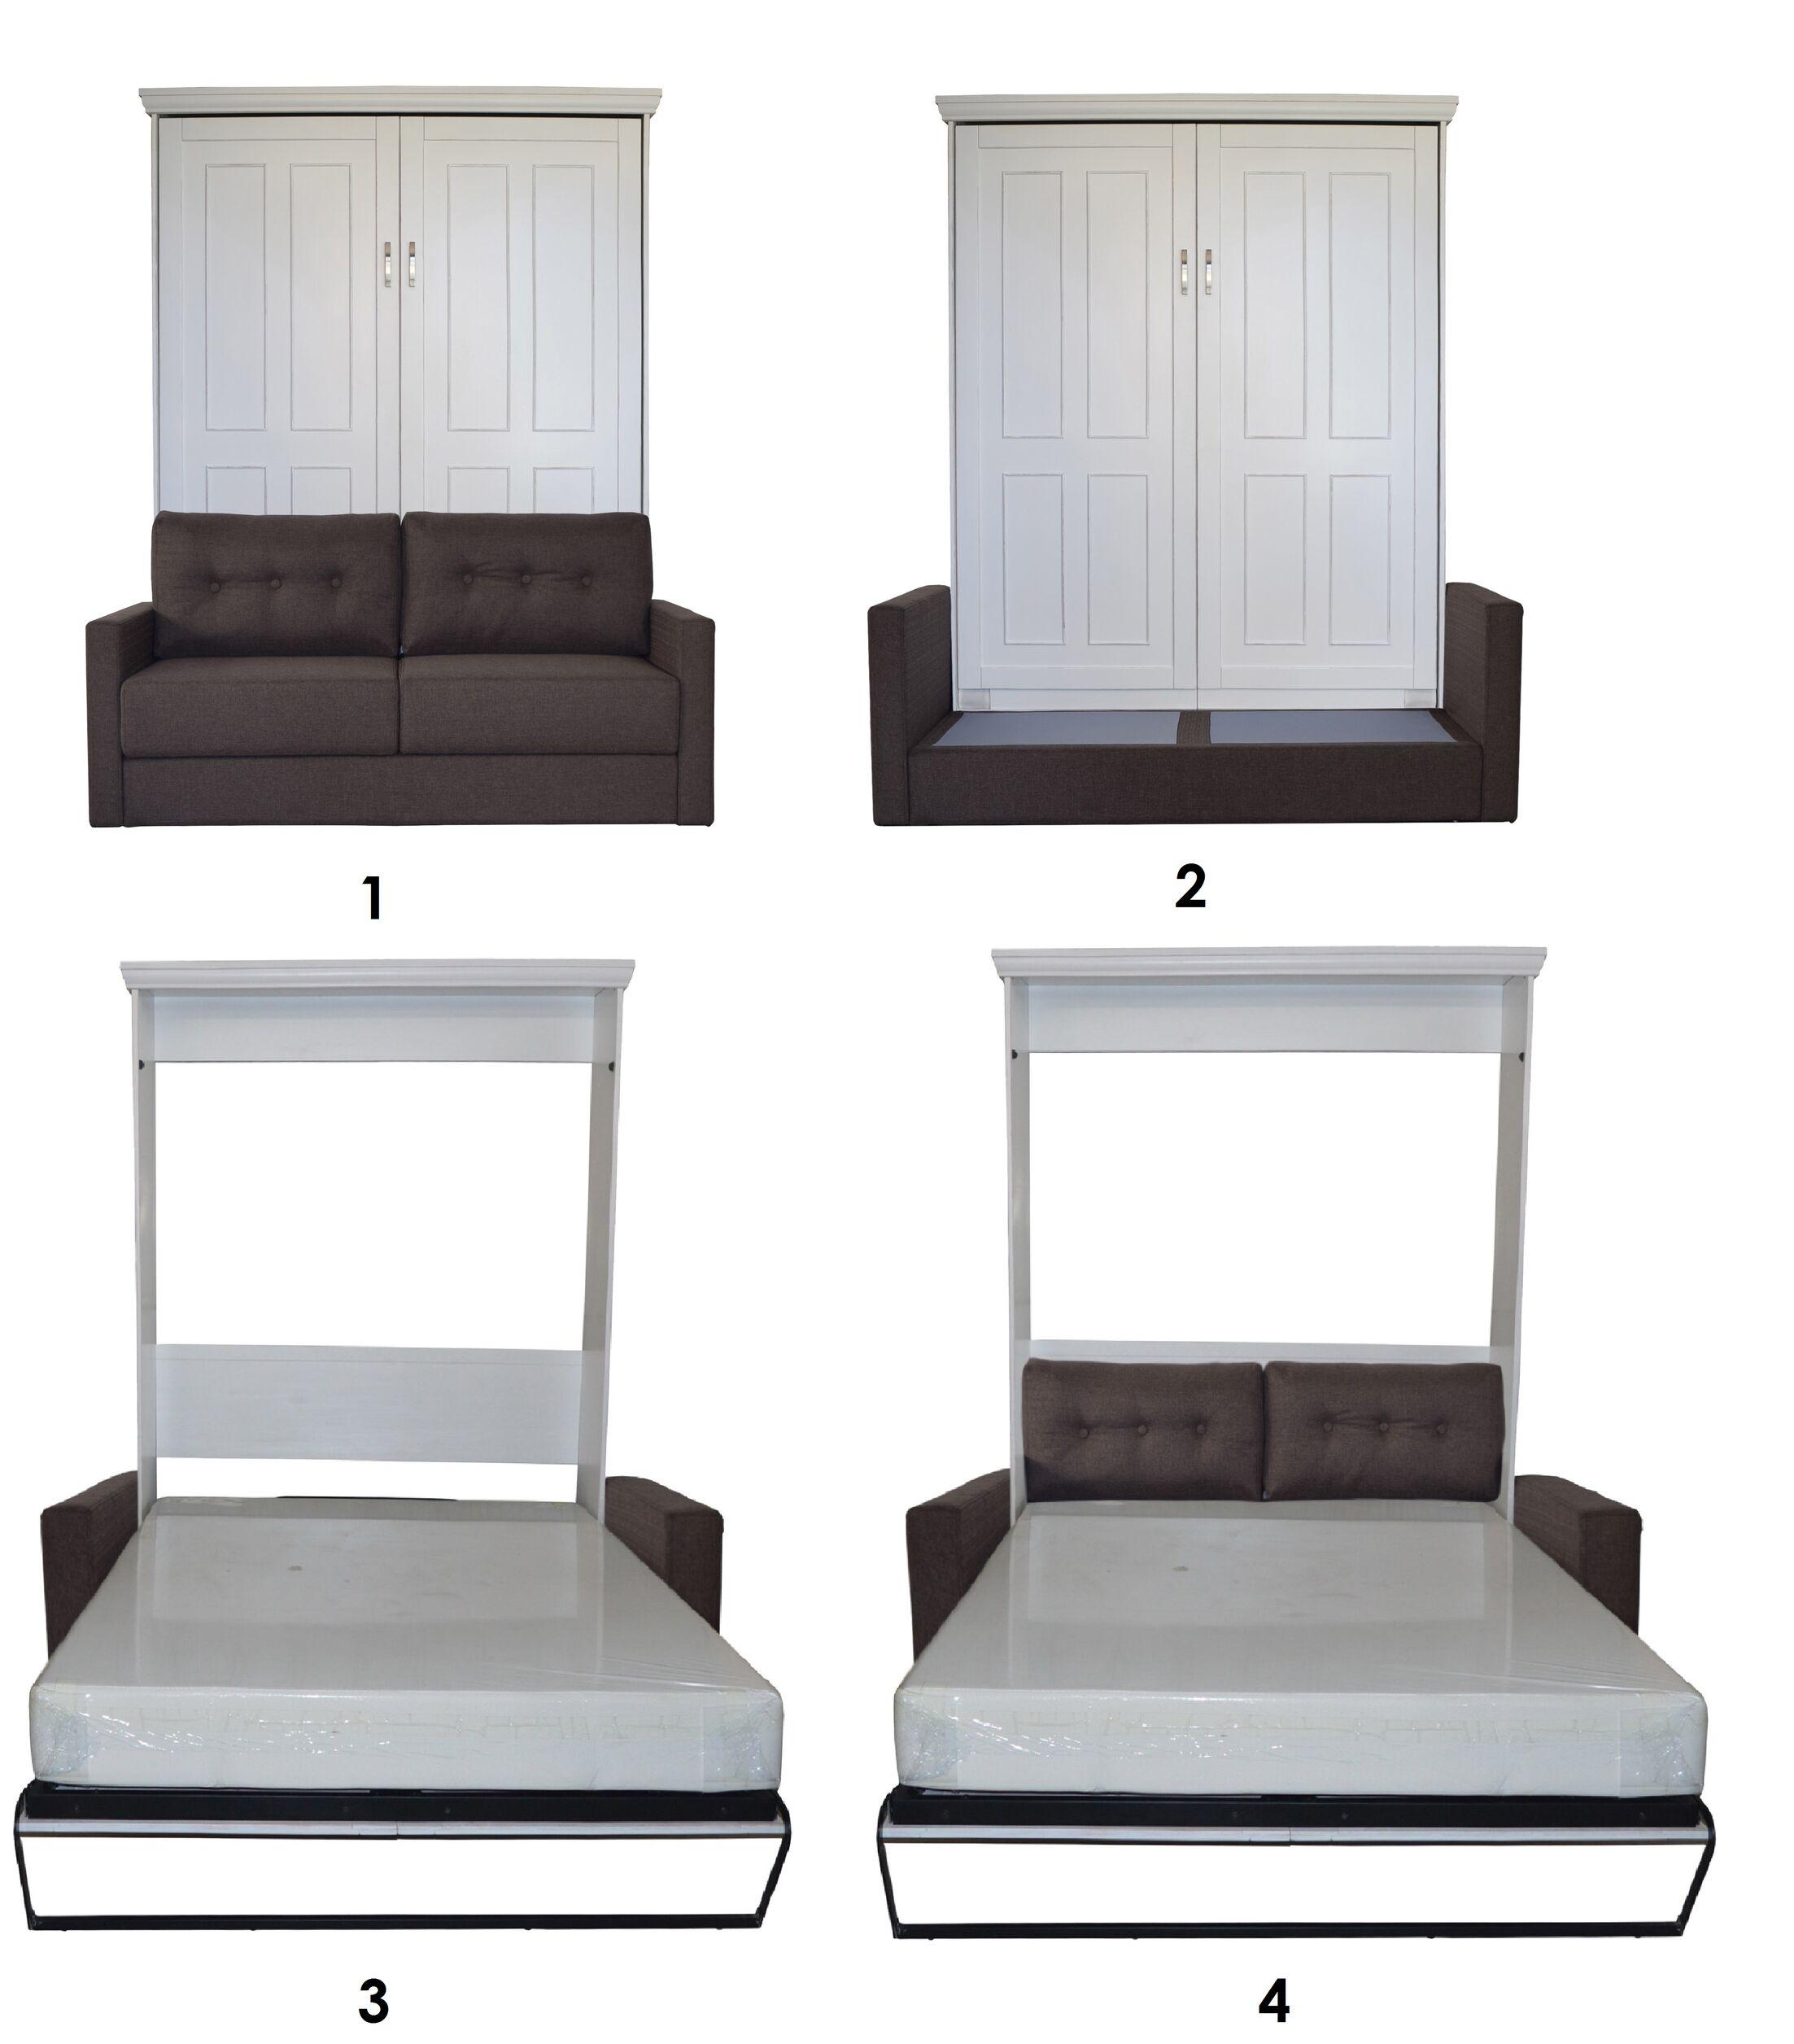 Sunset Dune Queen Upholstered Murphy Bed Frame Color: Antique White, Headboard Color: Scotts Highland